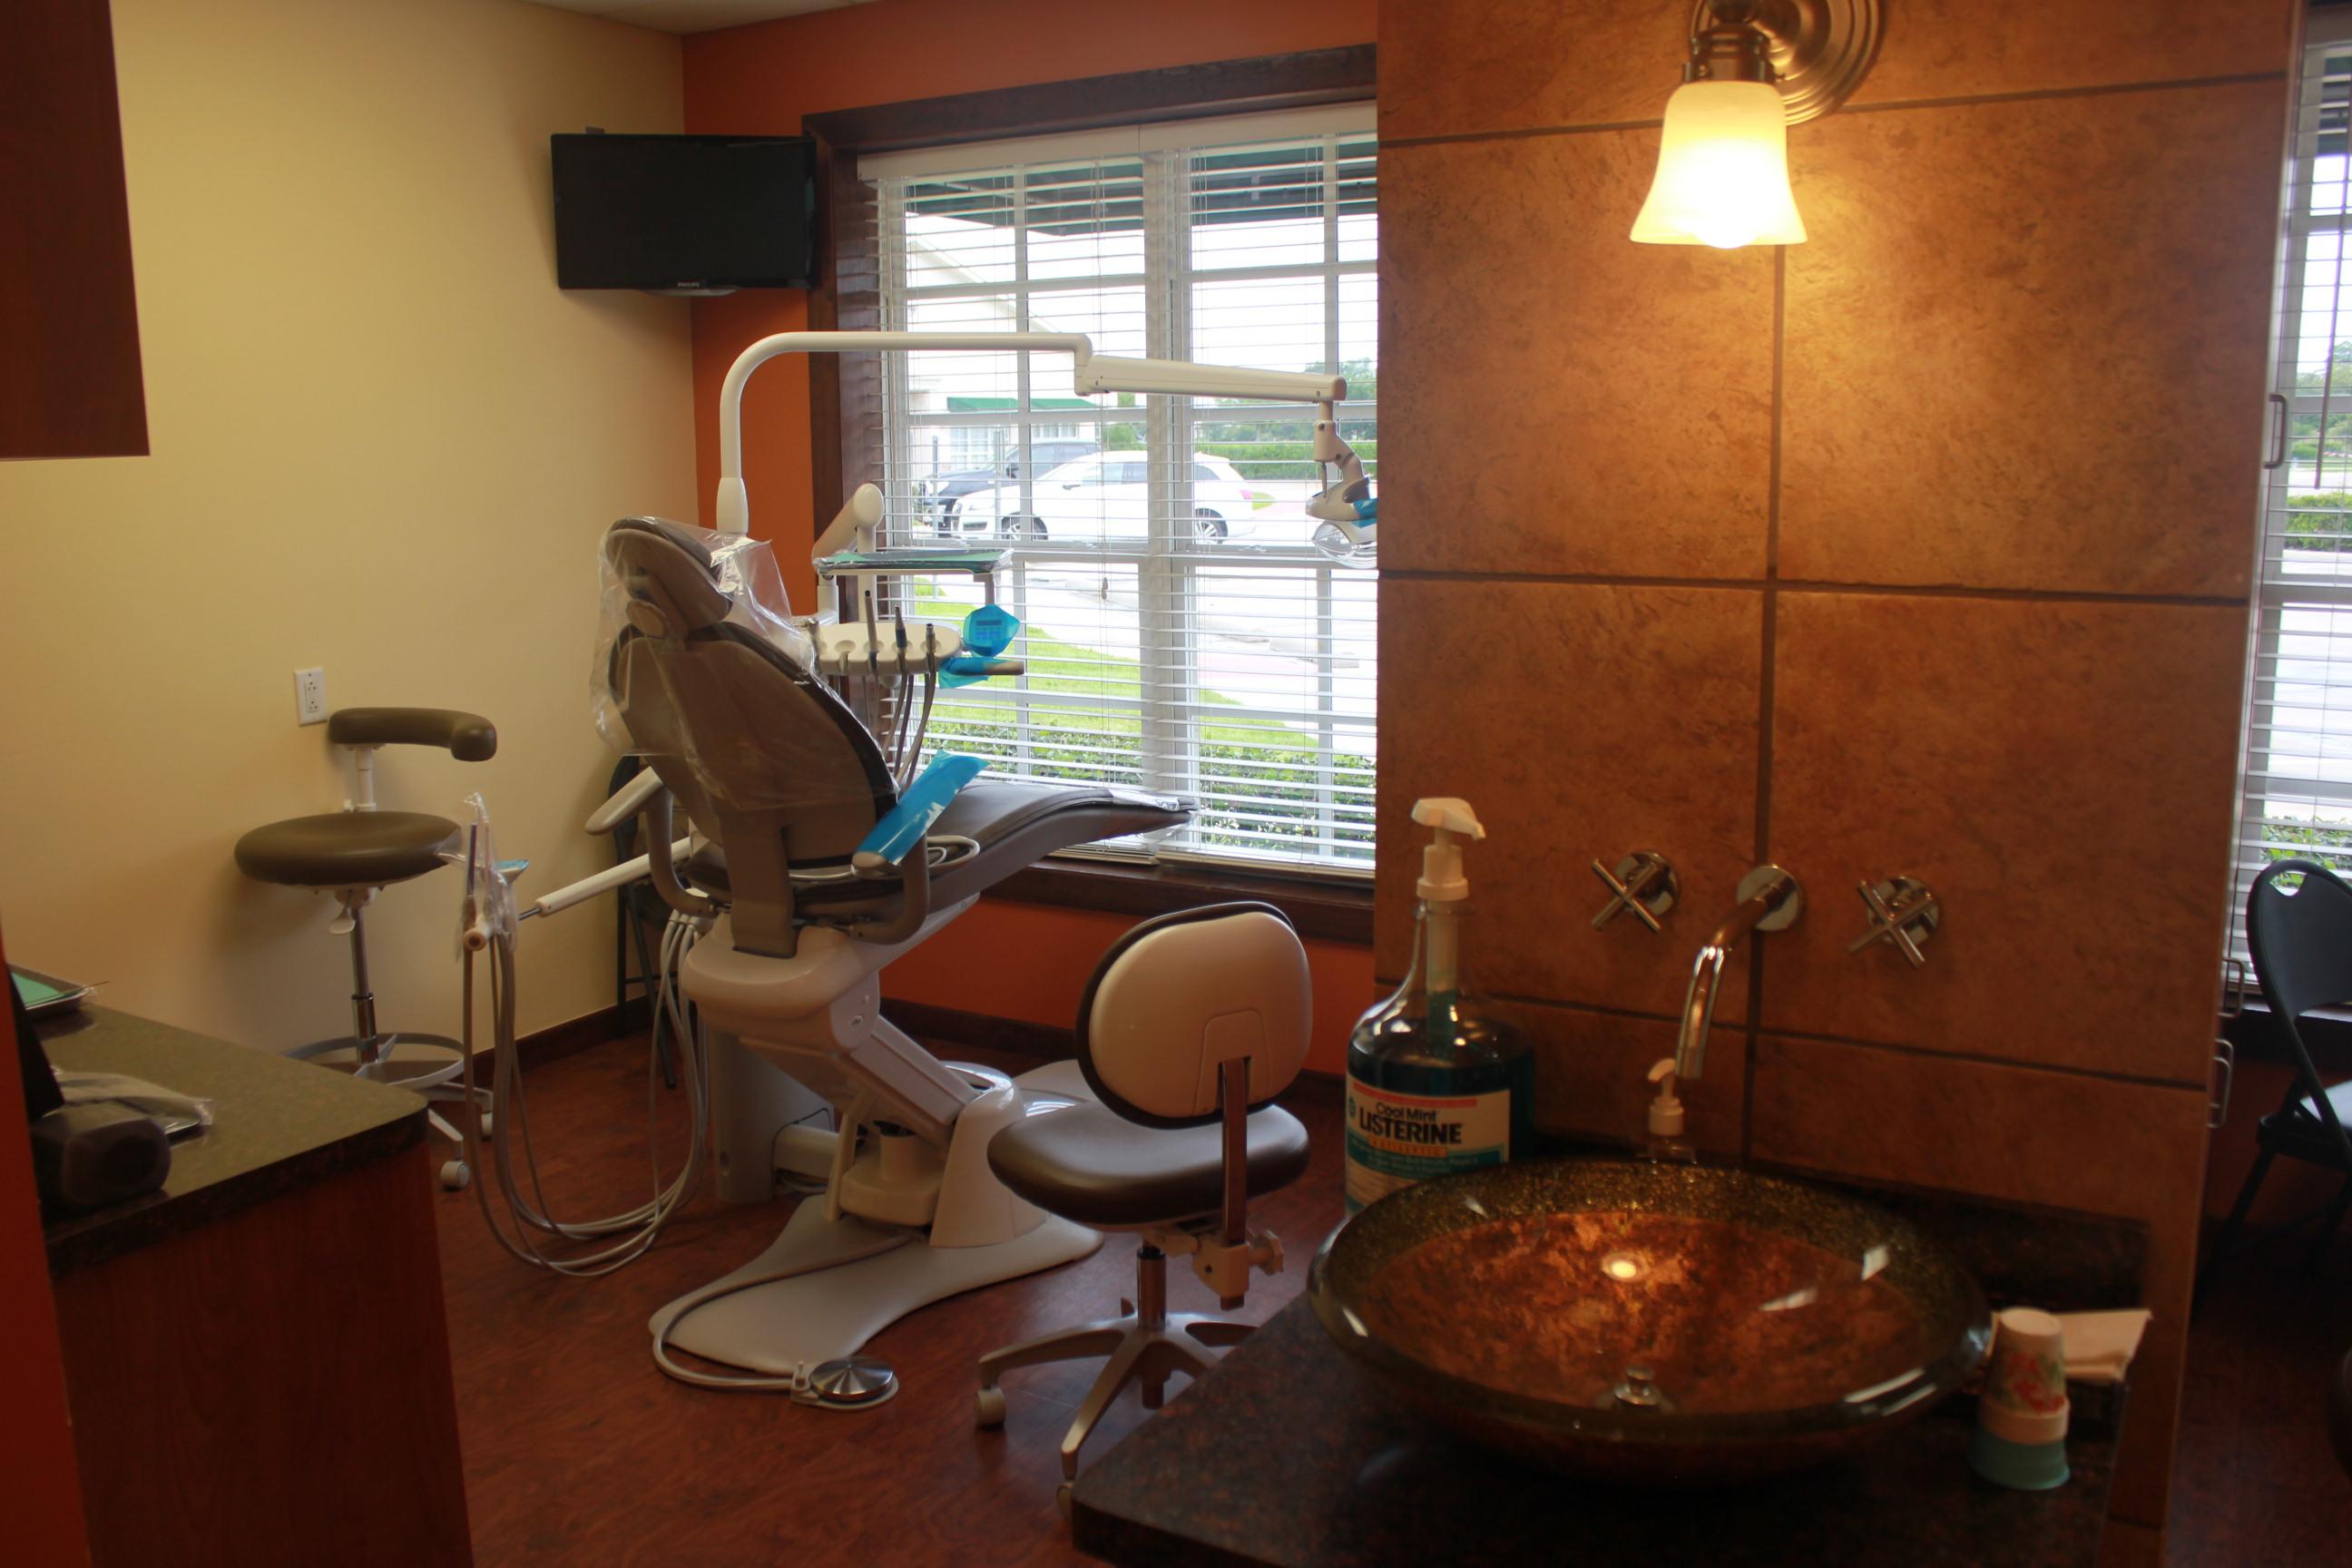 Aegis Dental image 3